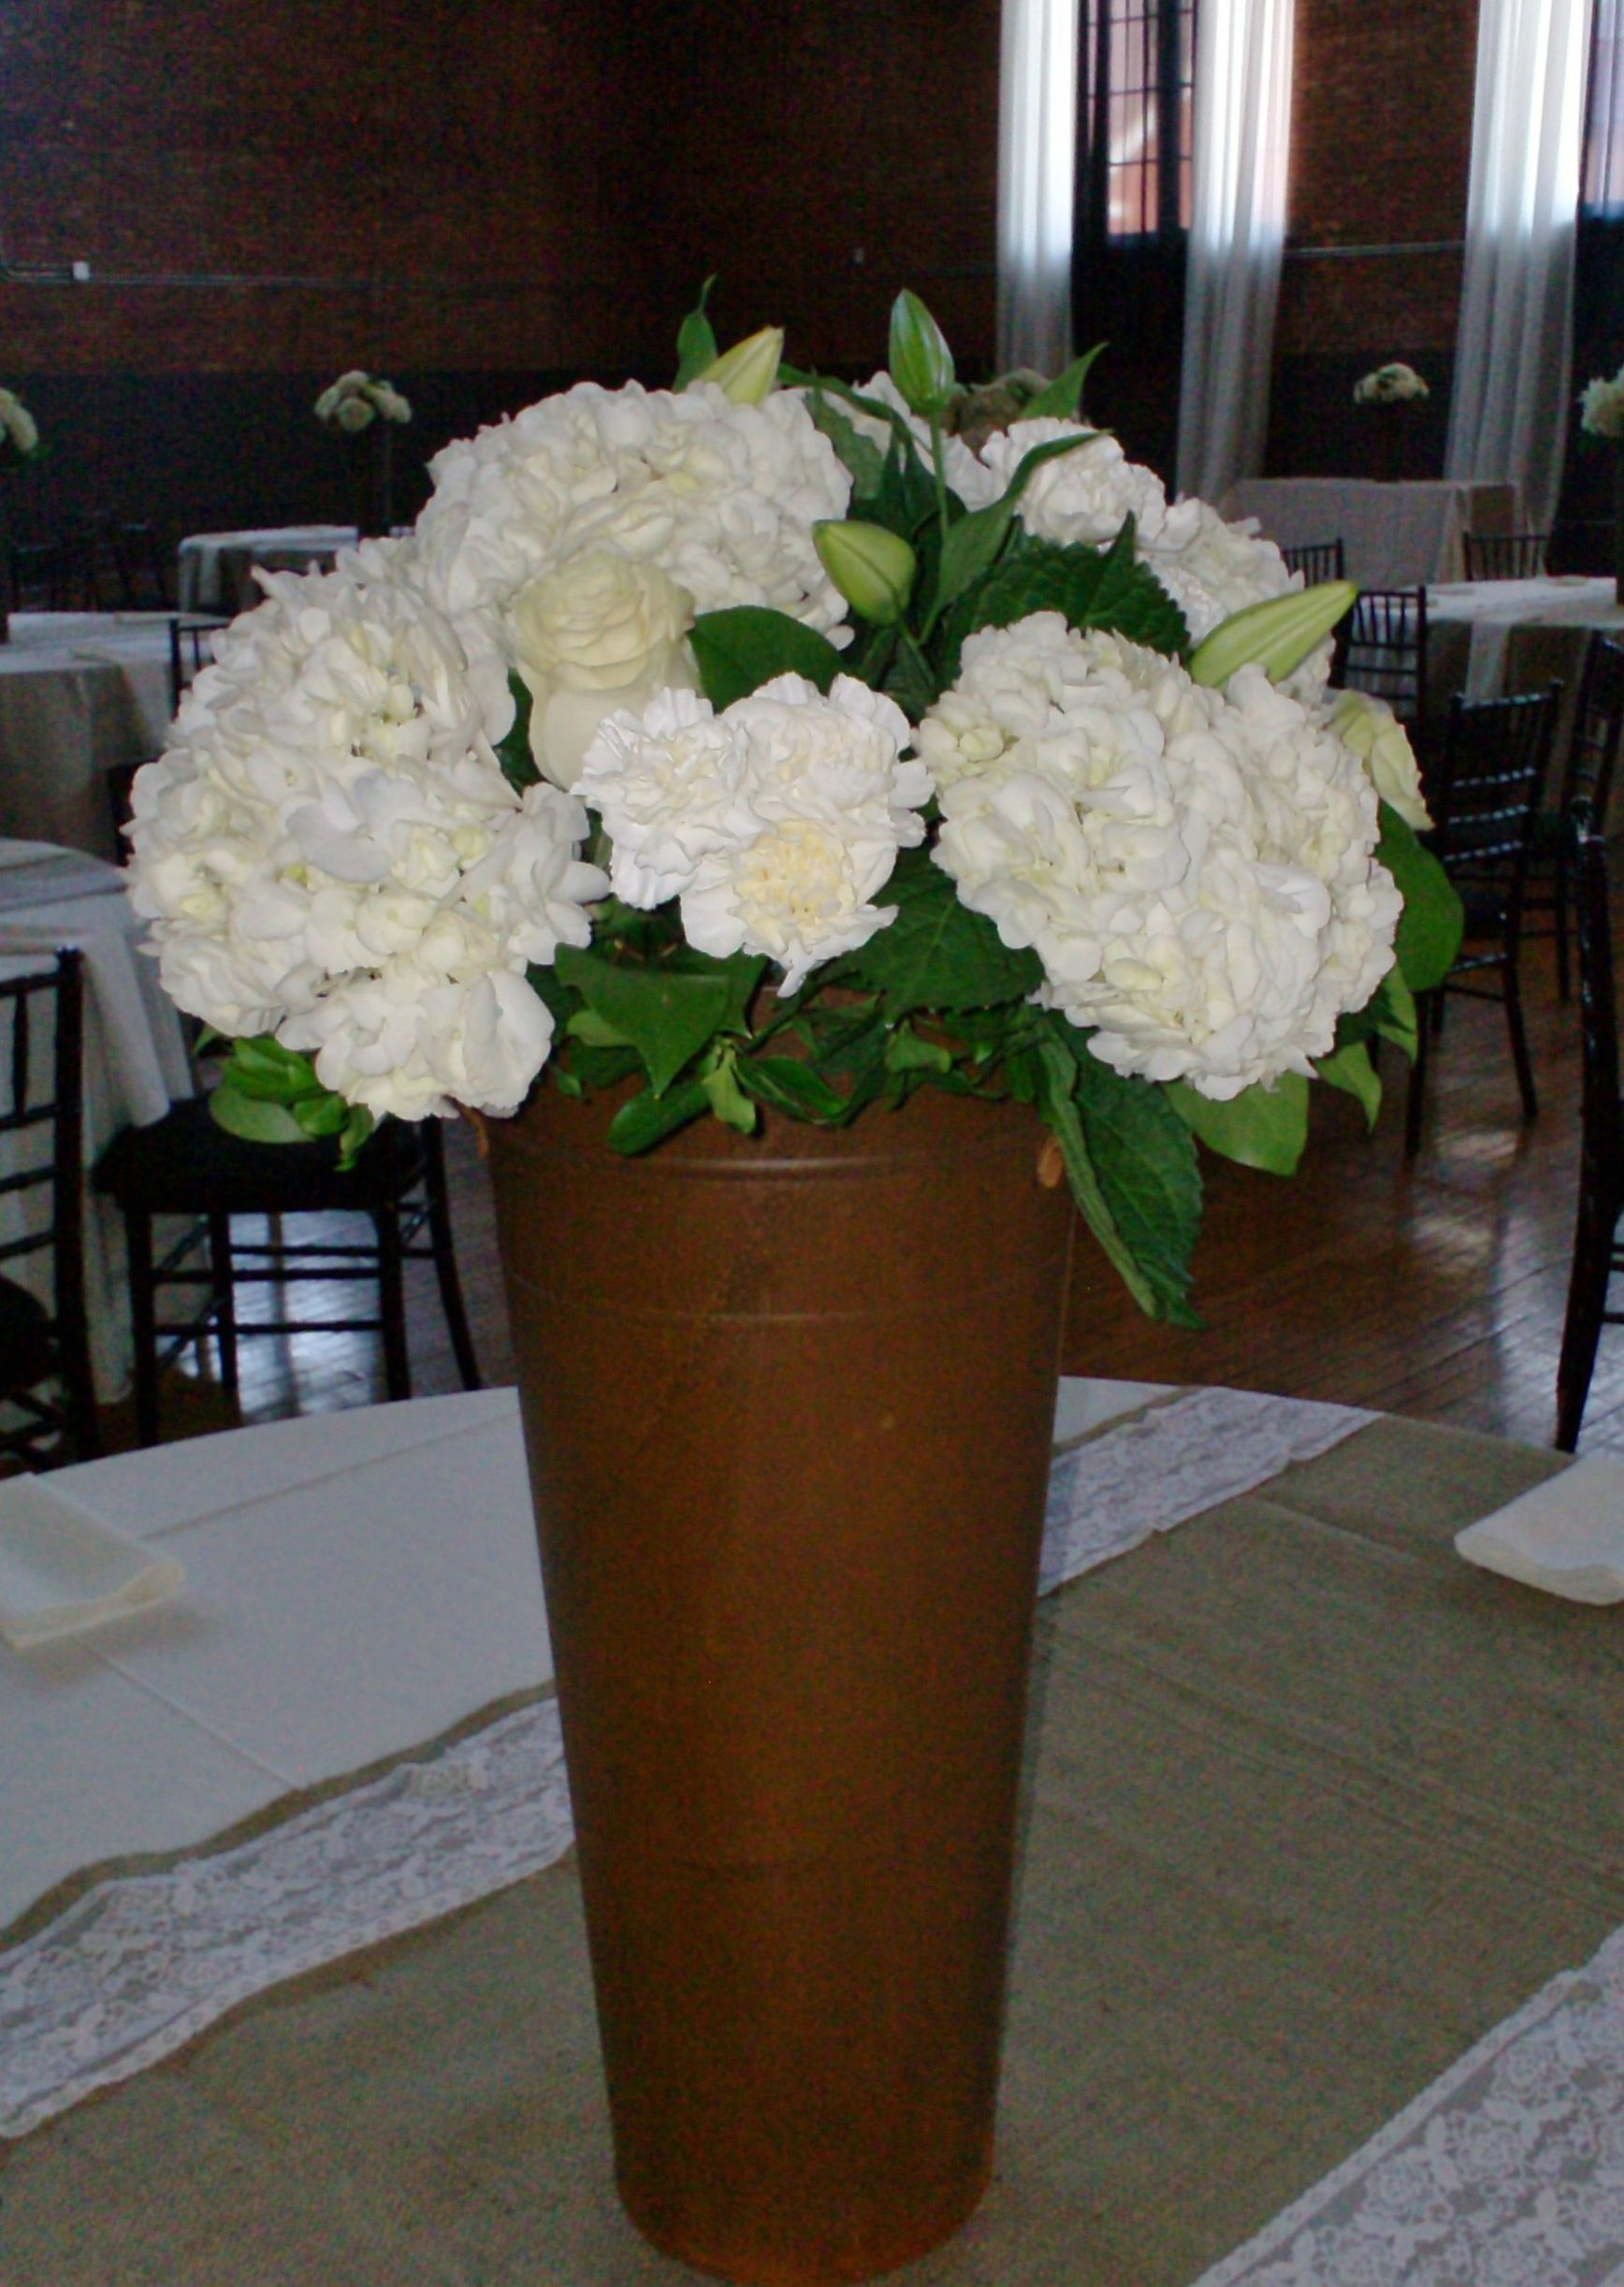 All white flowers in a rusty tin bucket sitting on a lace and burlap all white flowers in a rusty tin bucket sitting on a lace and burlap table runner mightylinksfo Gallery